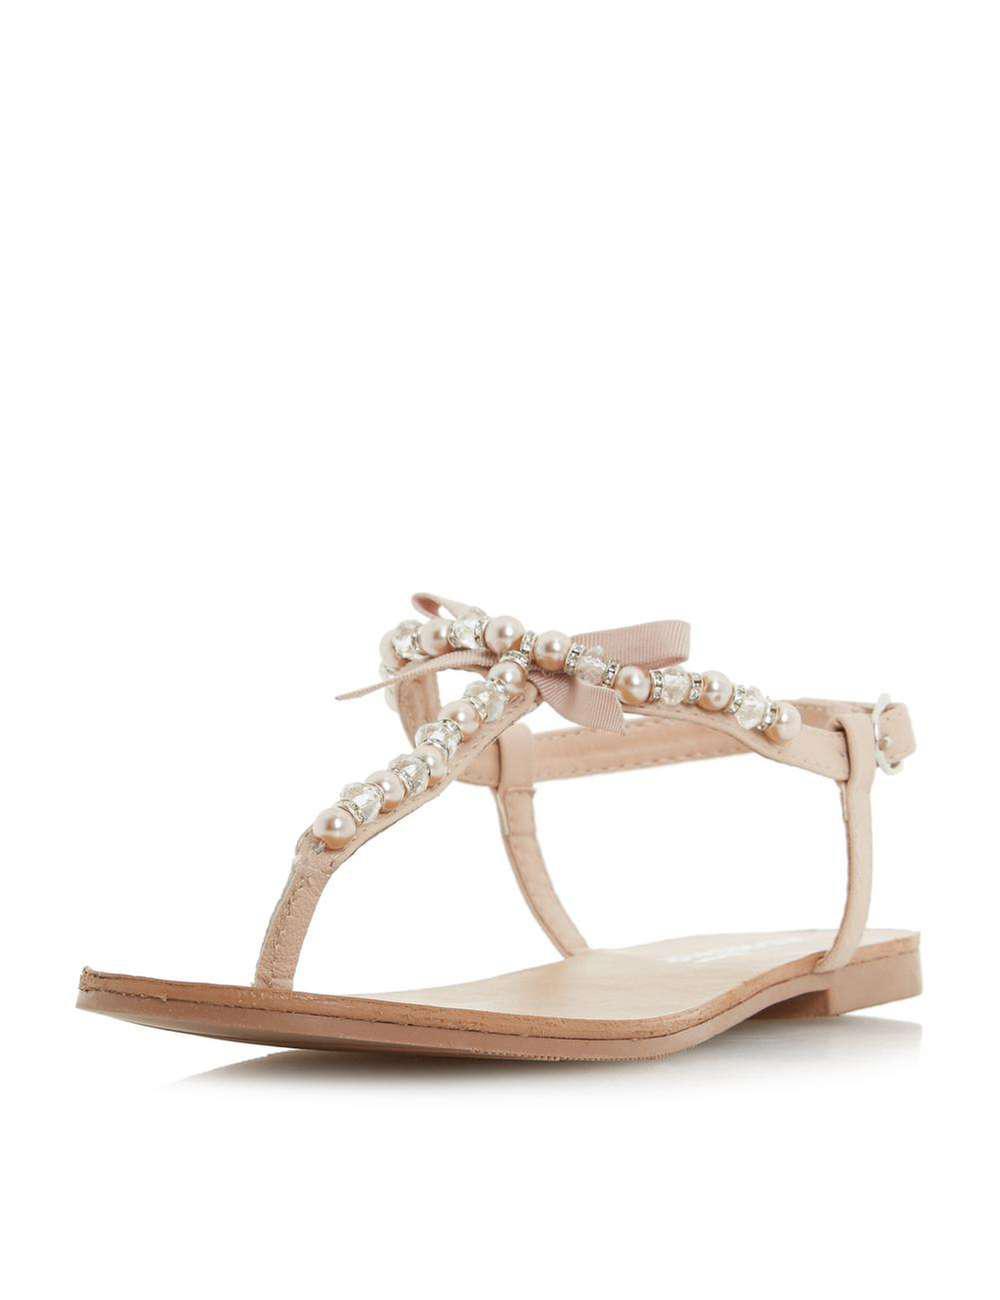 Magasin De Vente Dorothy Perkins Head Over Heels by Dune Nude 'Loula' Flat Sandals Vente 100% Garanti IBdxqhCF7